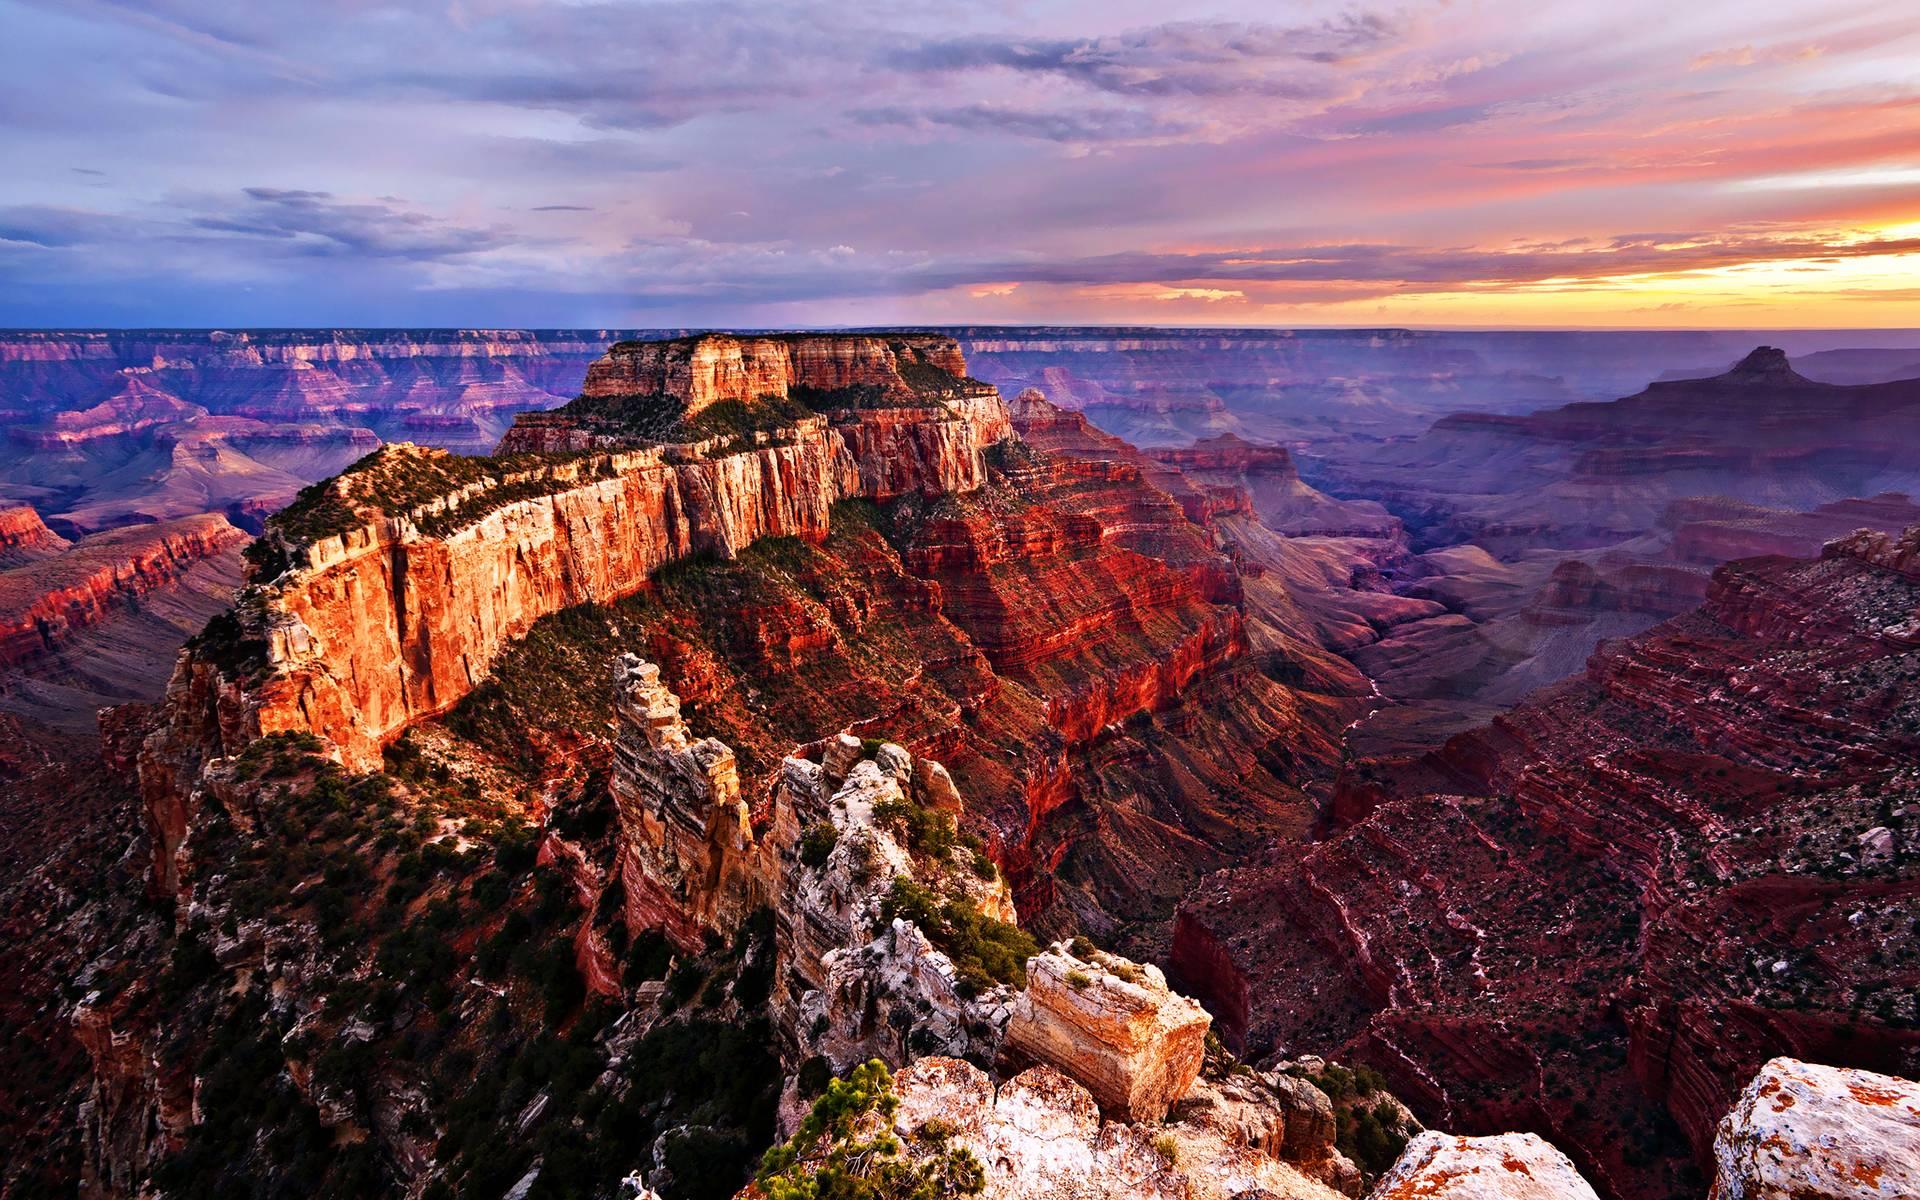 grand canyon 1920x1080 wallpaper - photo #2